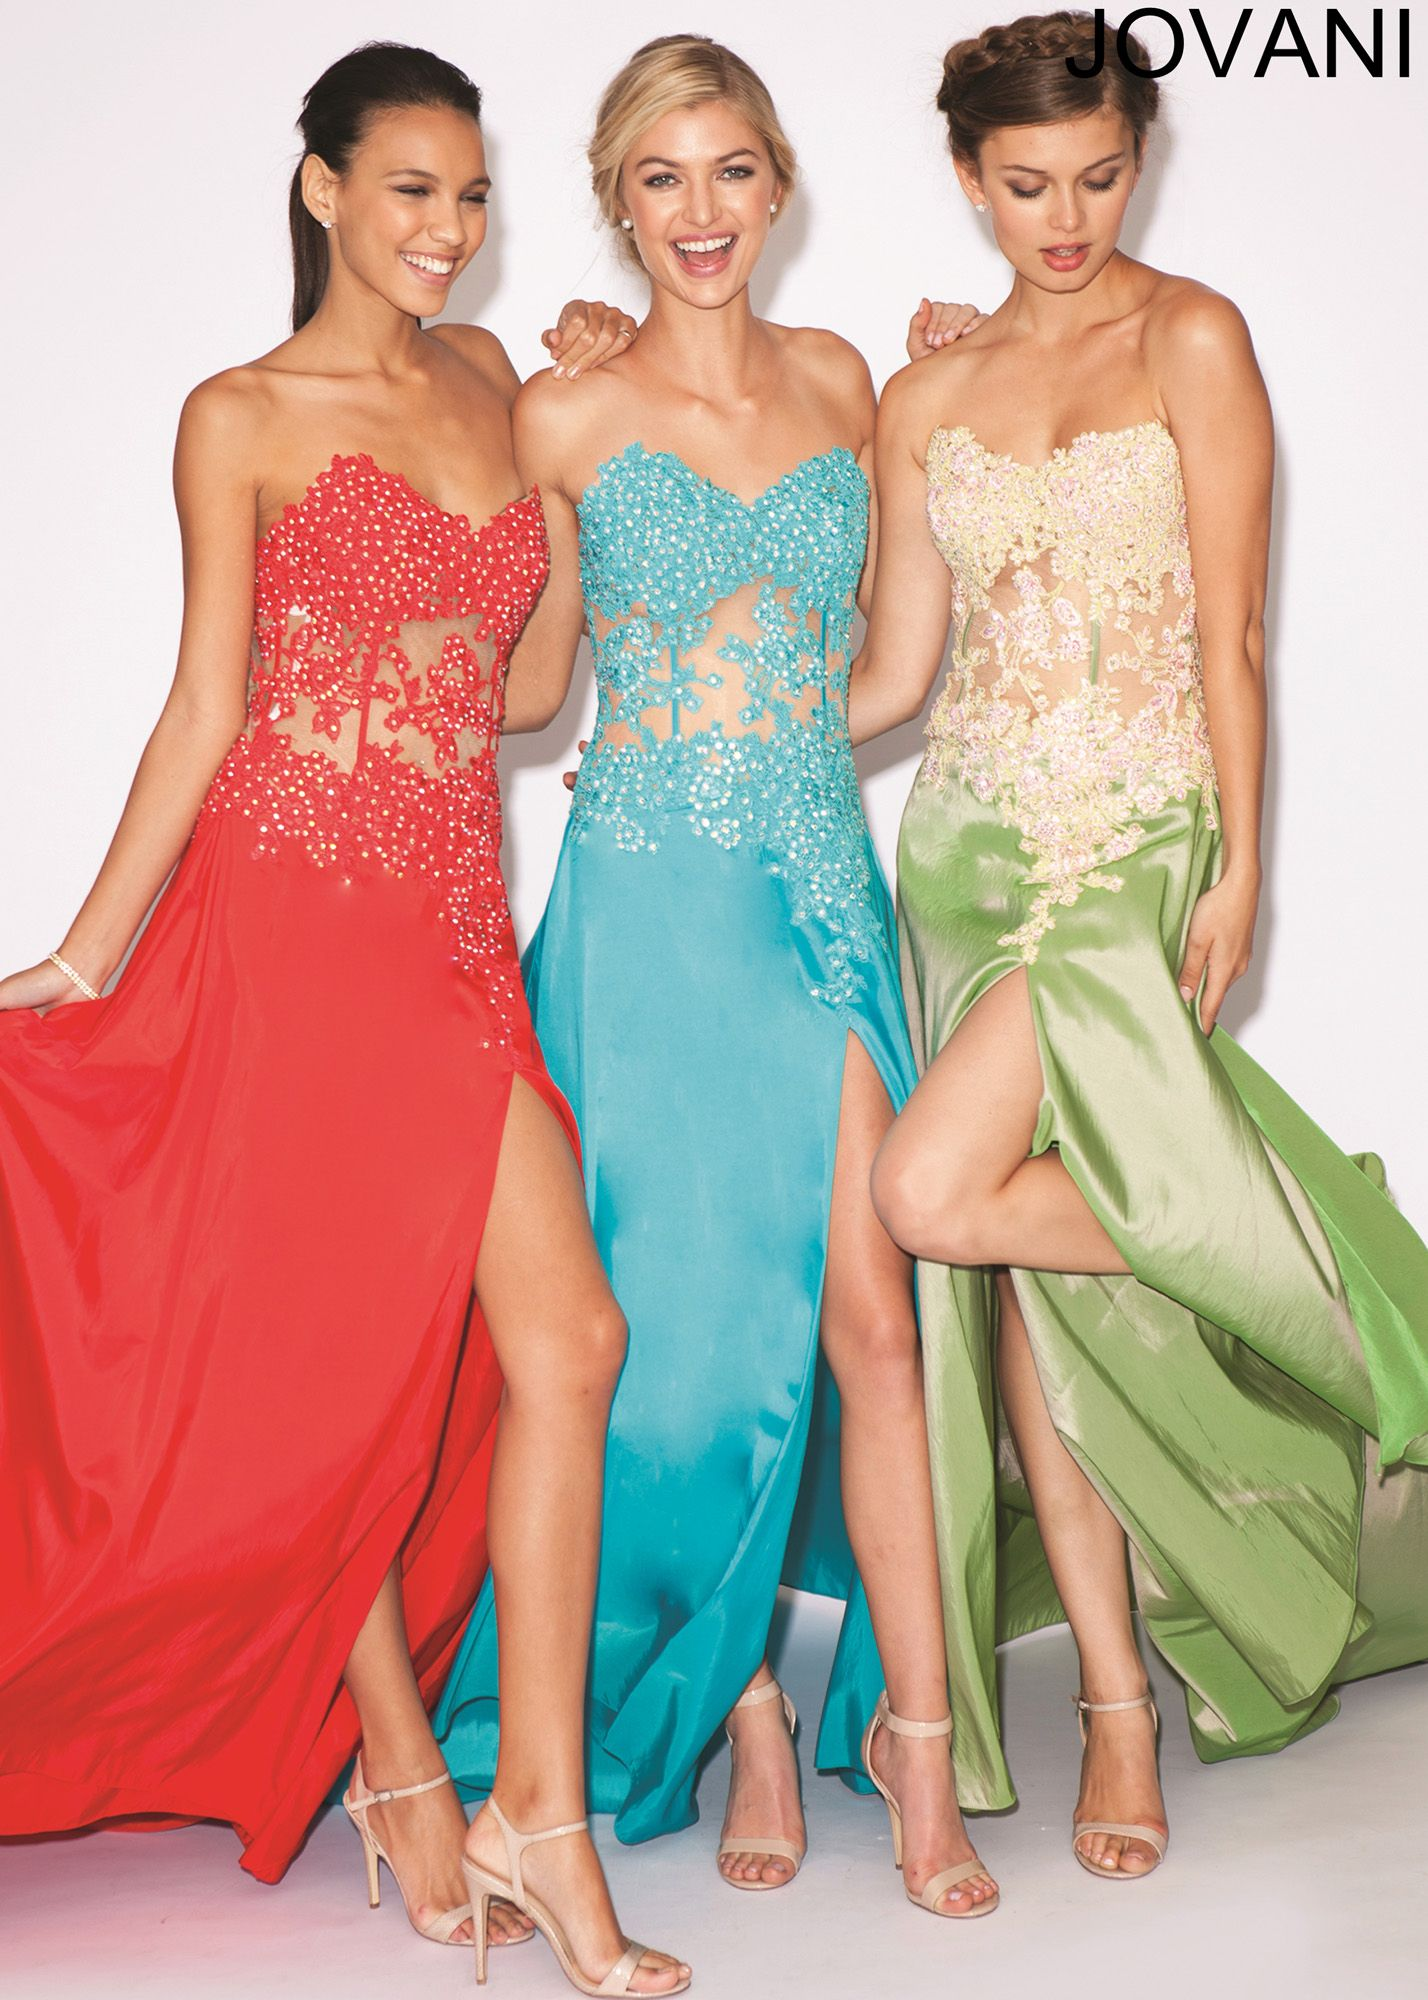 Jovani 10466 - Strapless Beaded Taffeta Sweetheart Prom Dresses ...